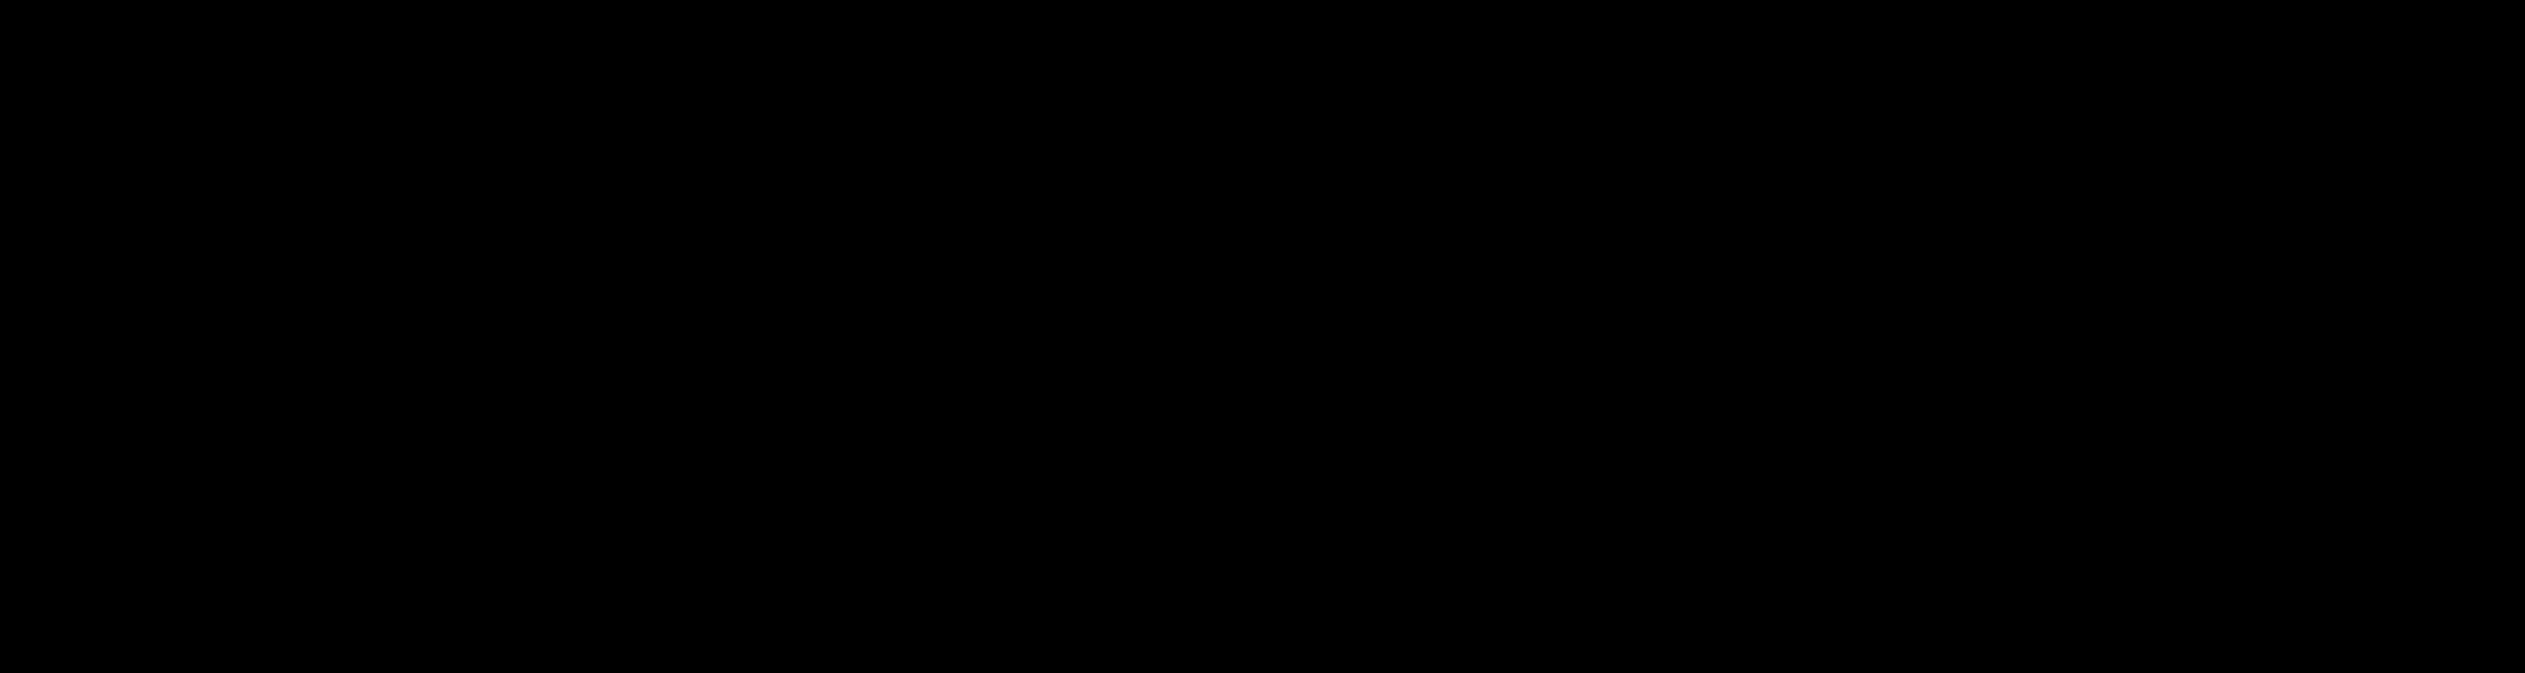 N2-t-Boc-N<sub>6</sub>-(biotinamido-6-N-caproylamido)lysine